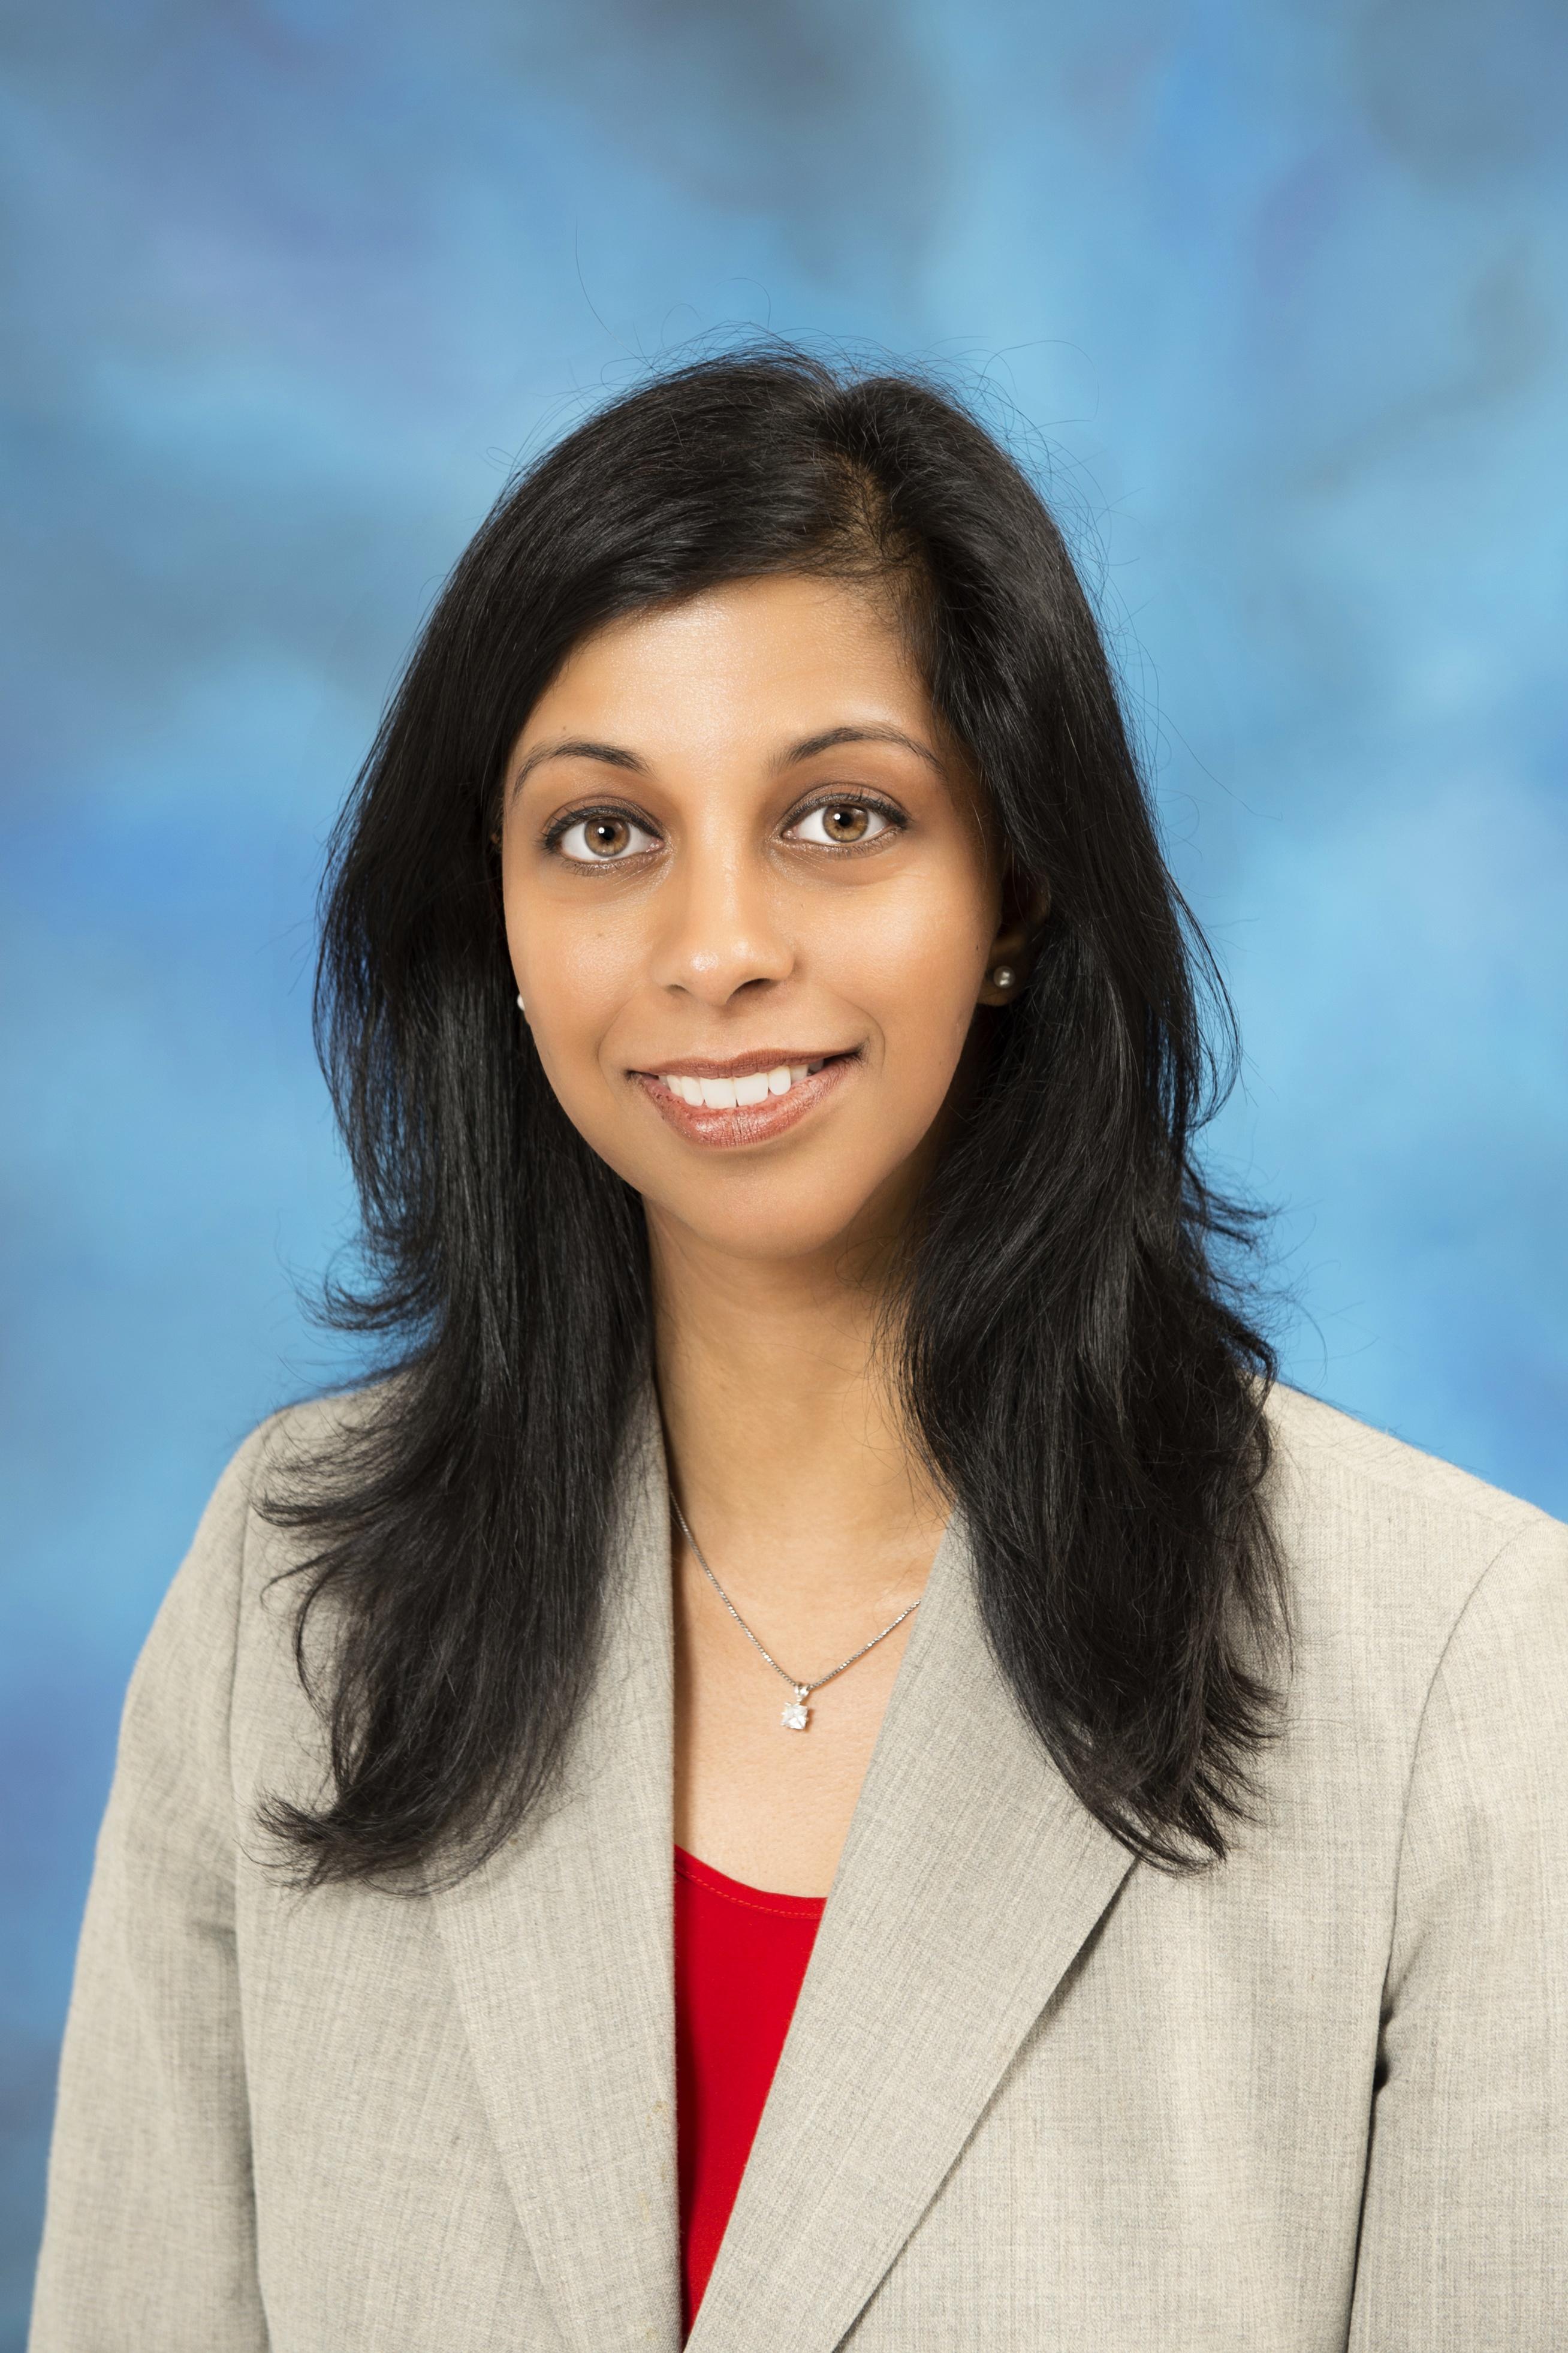 Photo of Sruti Shiva, PhD